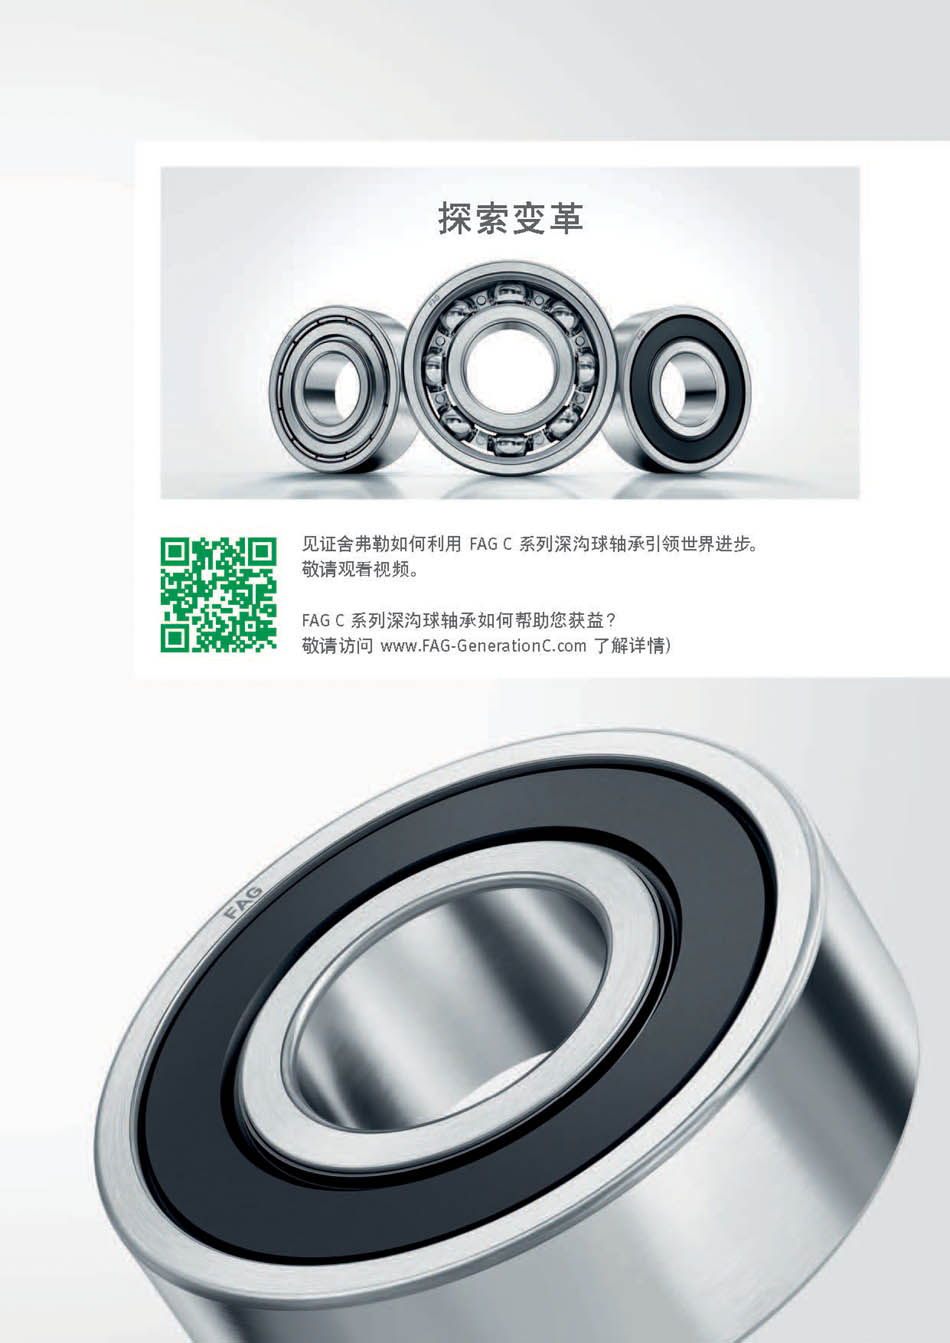 Brochure_GenerationC_CN_lowres4 (2)_页面_03.jpg